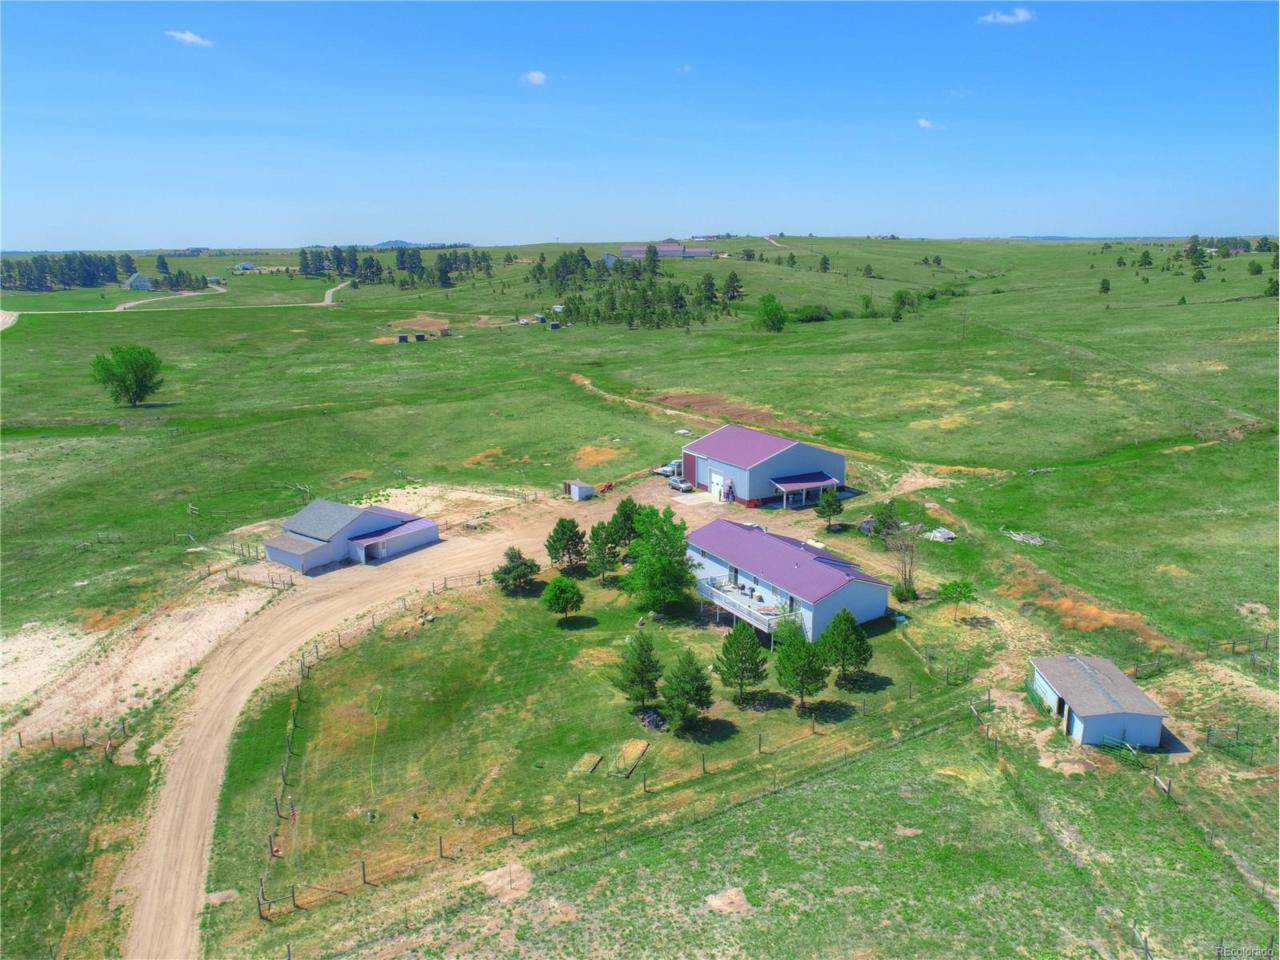 10326 County Road 110, Kiowa, CO 80117 (MLS #7367429) :: 8z Real Estate